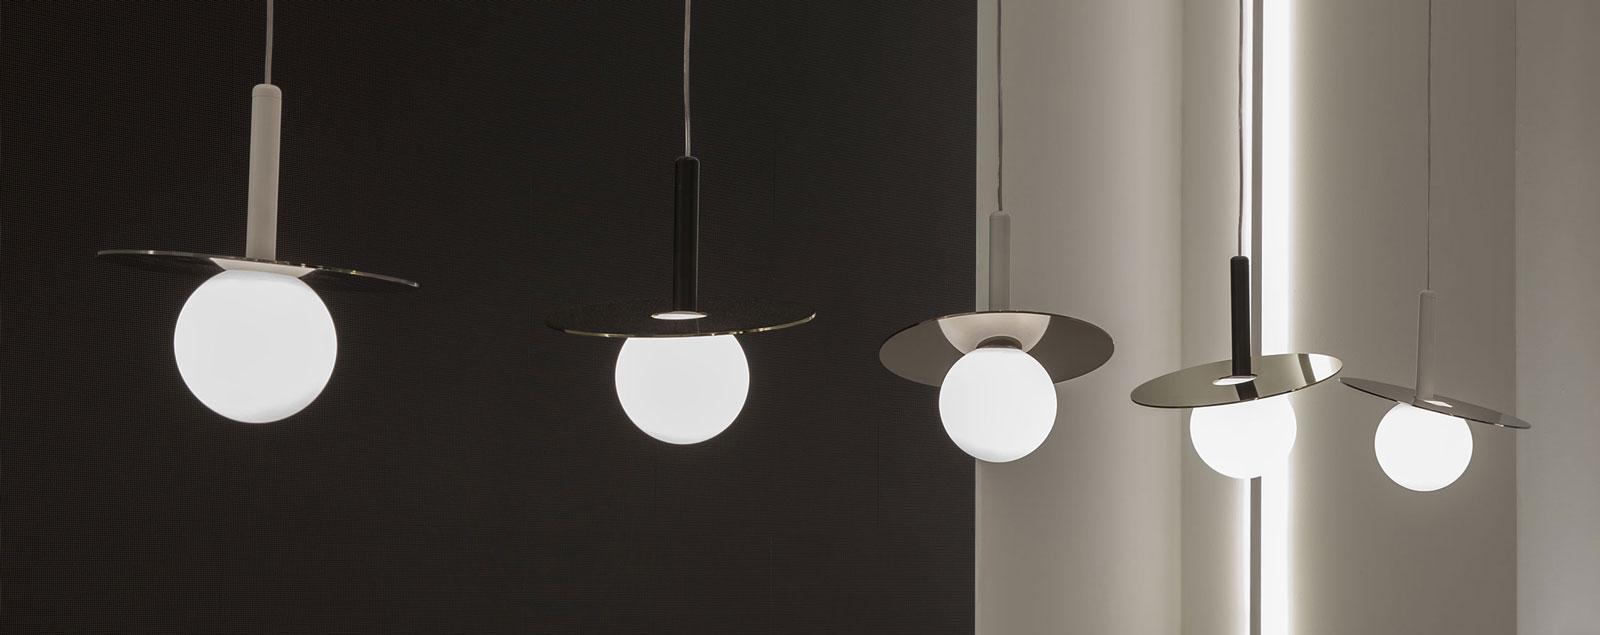 Studio La Sala Milano lighting project: offices bars restaurants exhibitions